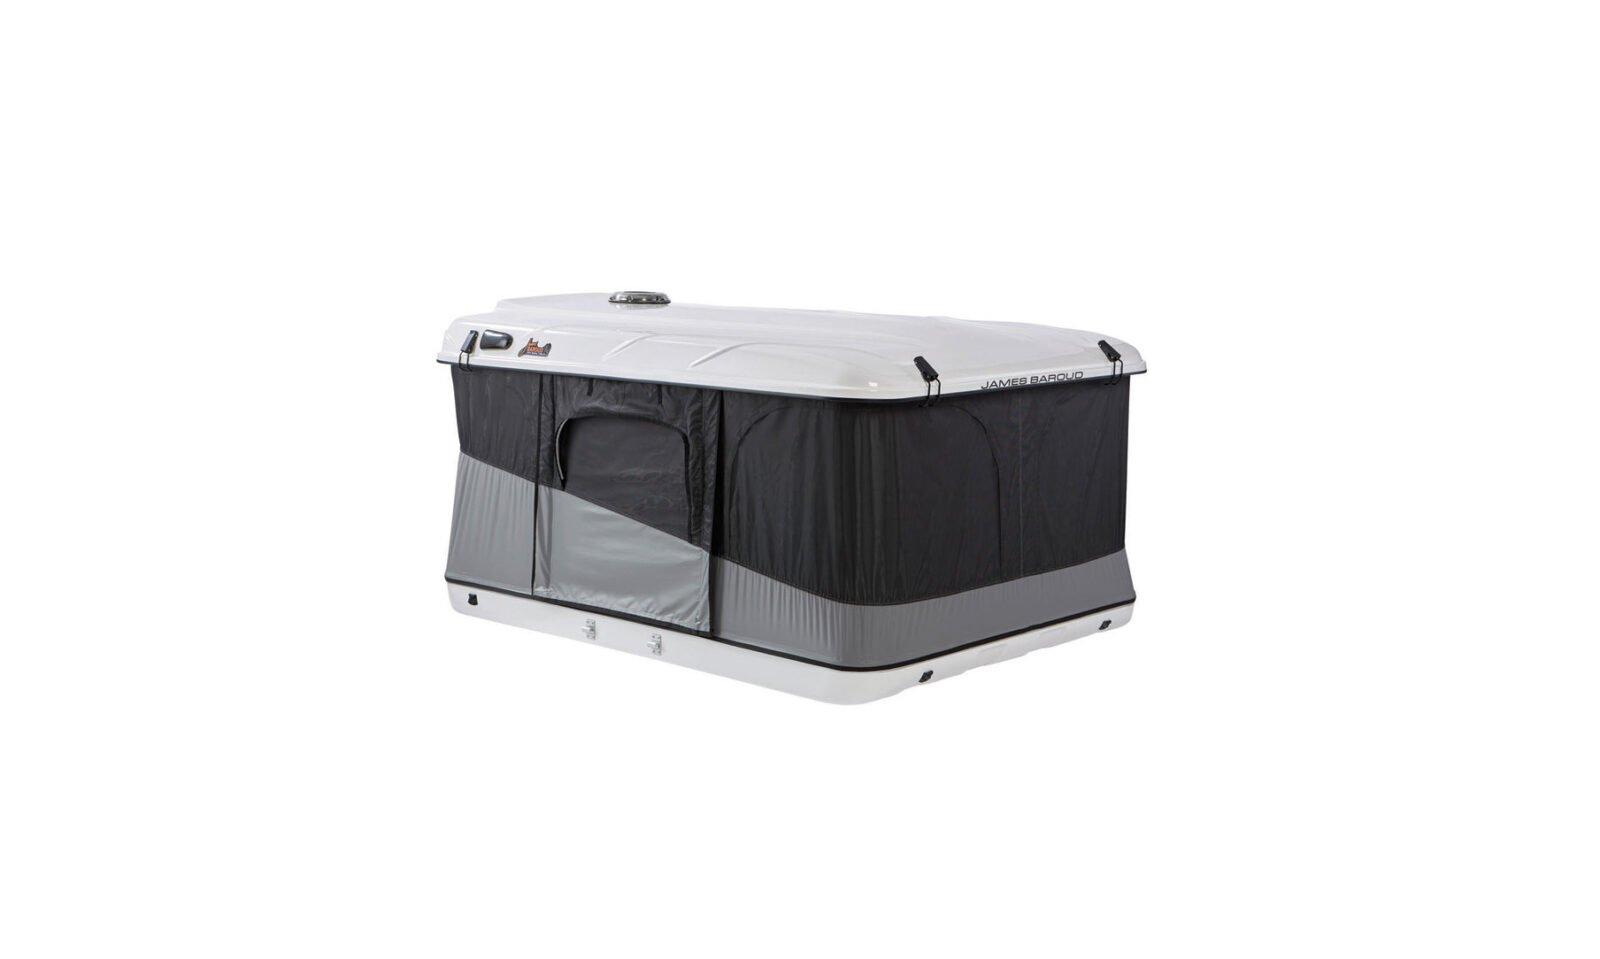 sc 1 st  Silodrome & Evasion Evolution Rooftop Tent